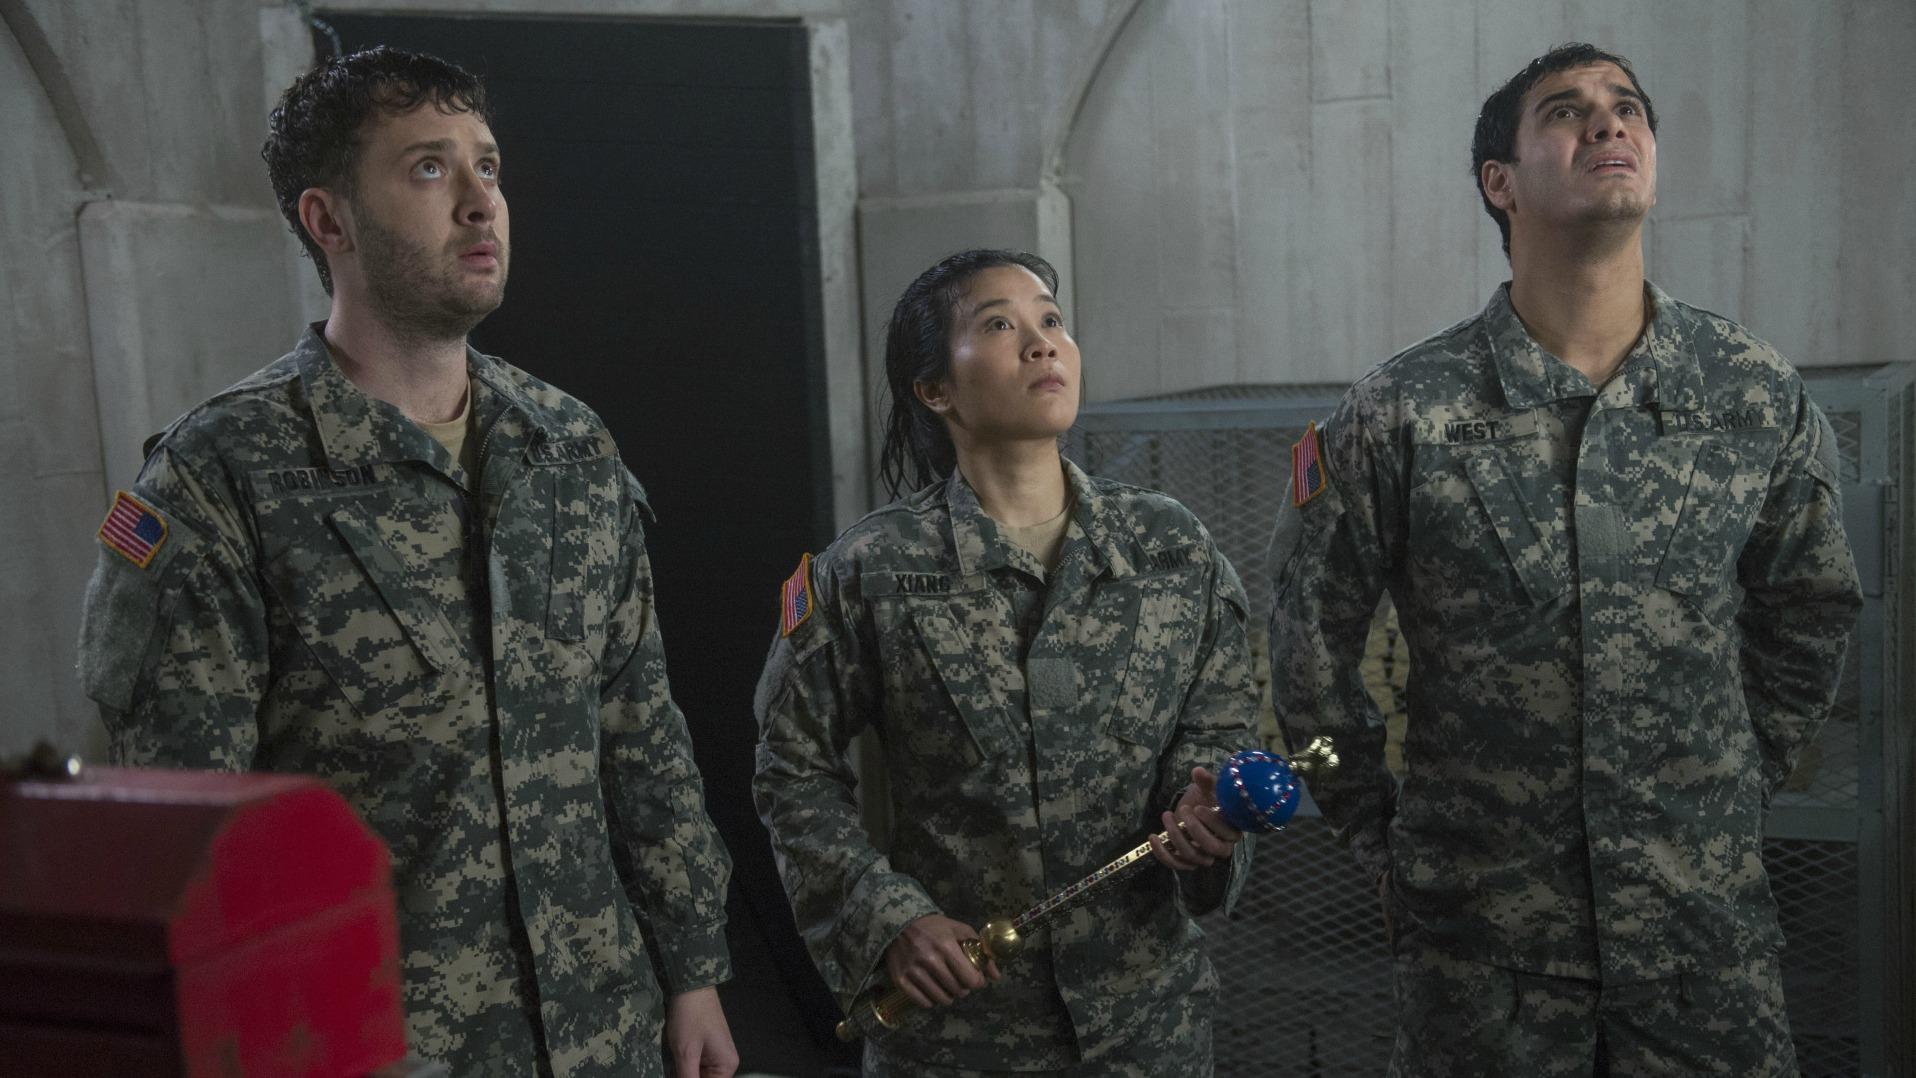 Eddie Kaye Thomas as Toby Curtis, Jadyn Wong as Happy Quinn, and Elyes Gabel as Walter O'Brien